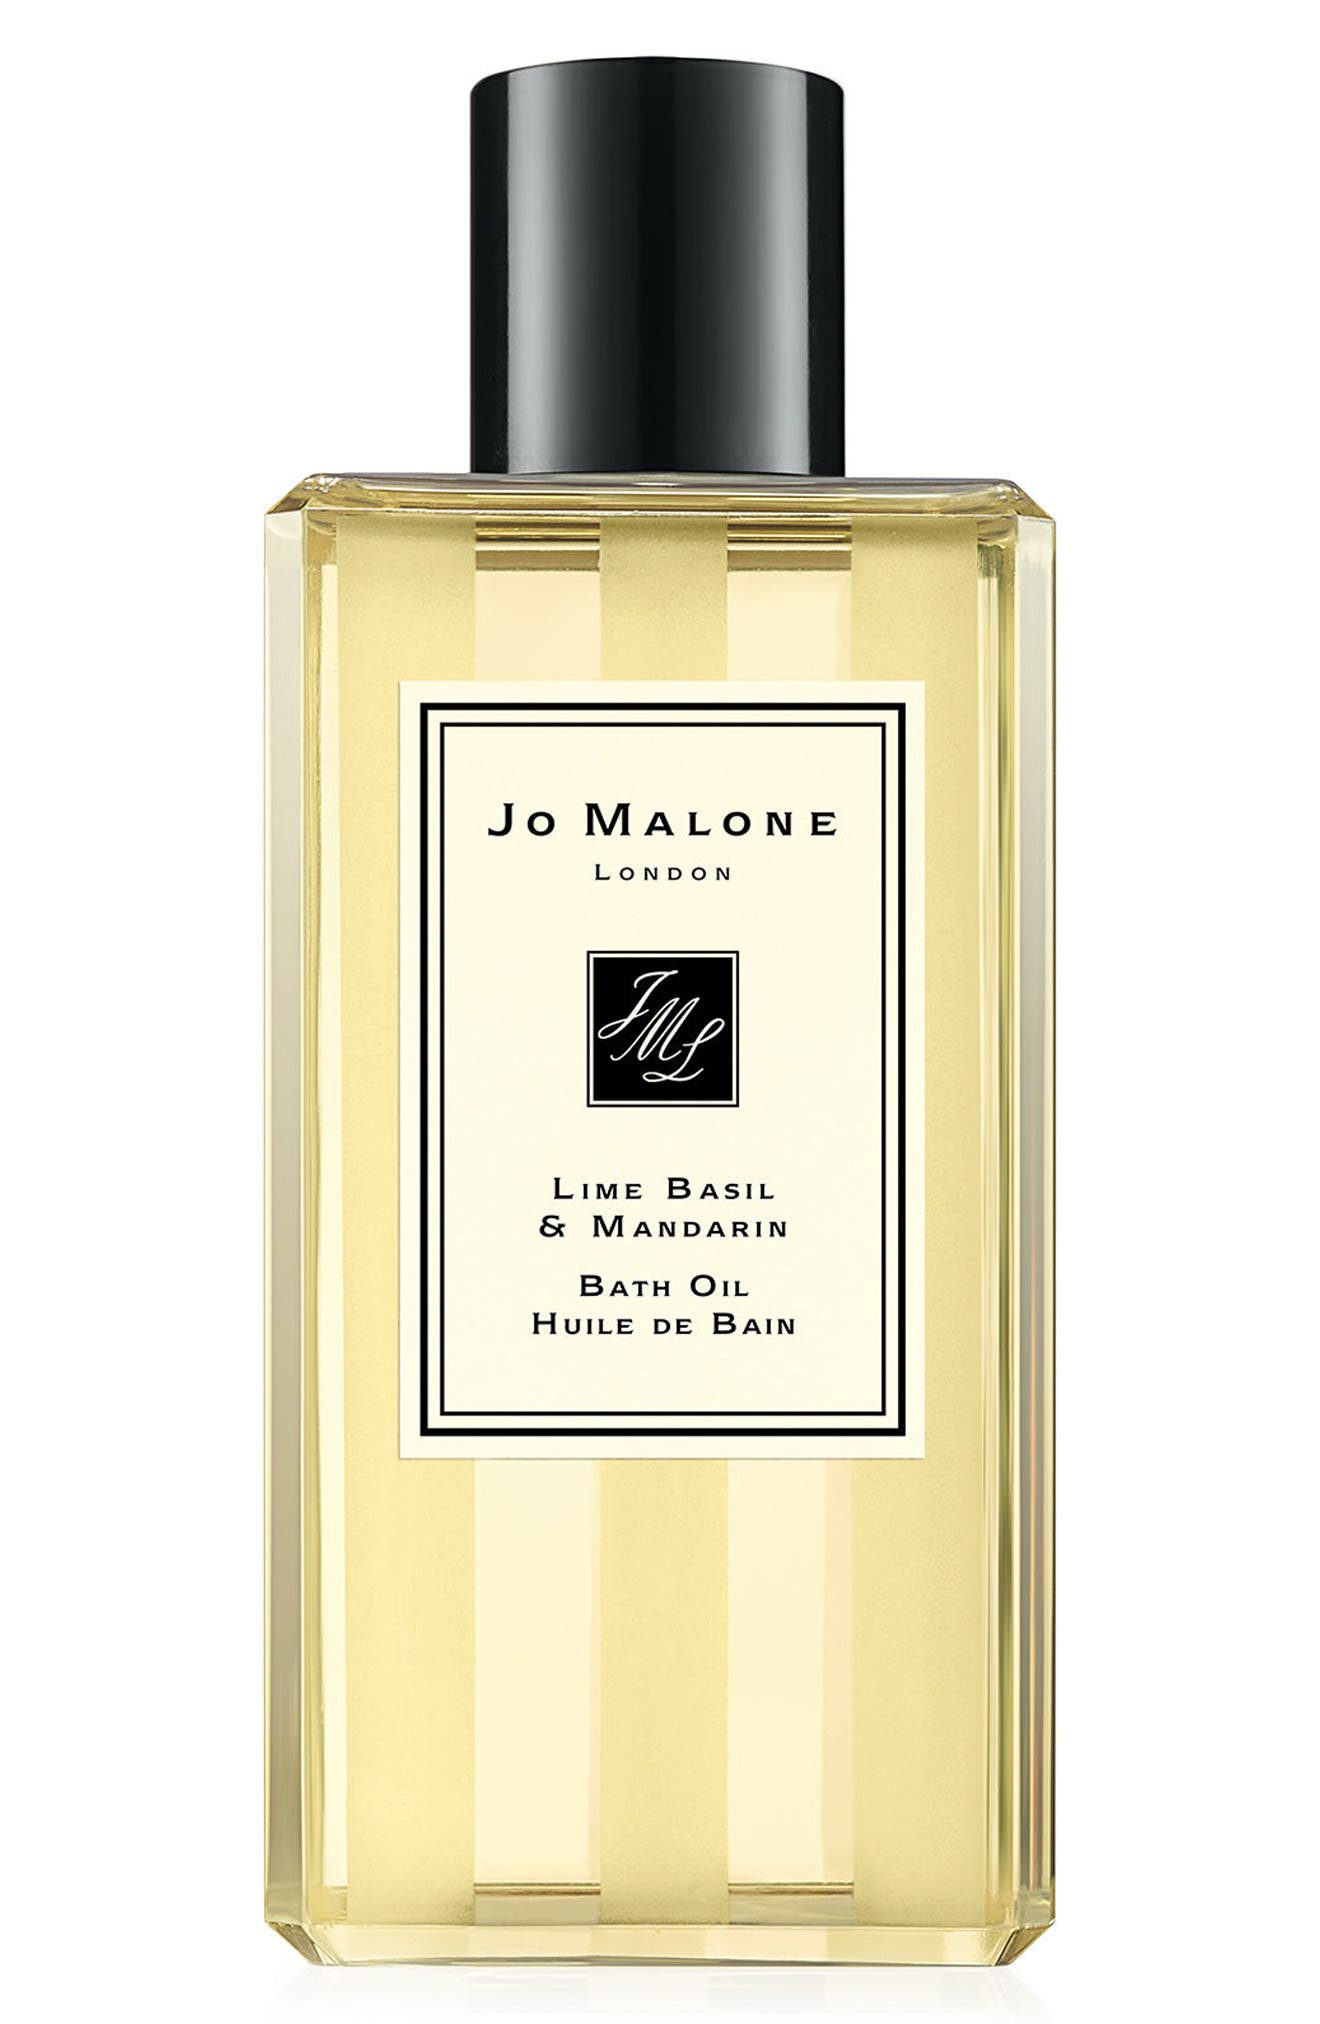 Jo Malone London(TM) Lime Basil & Mandarin Bath Oil